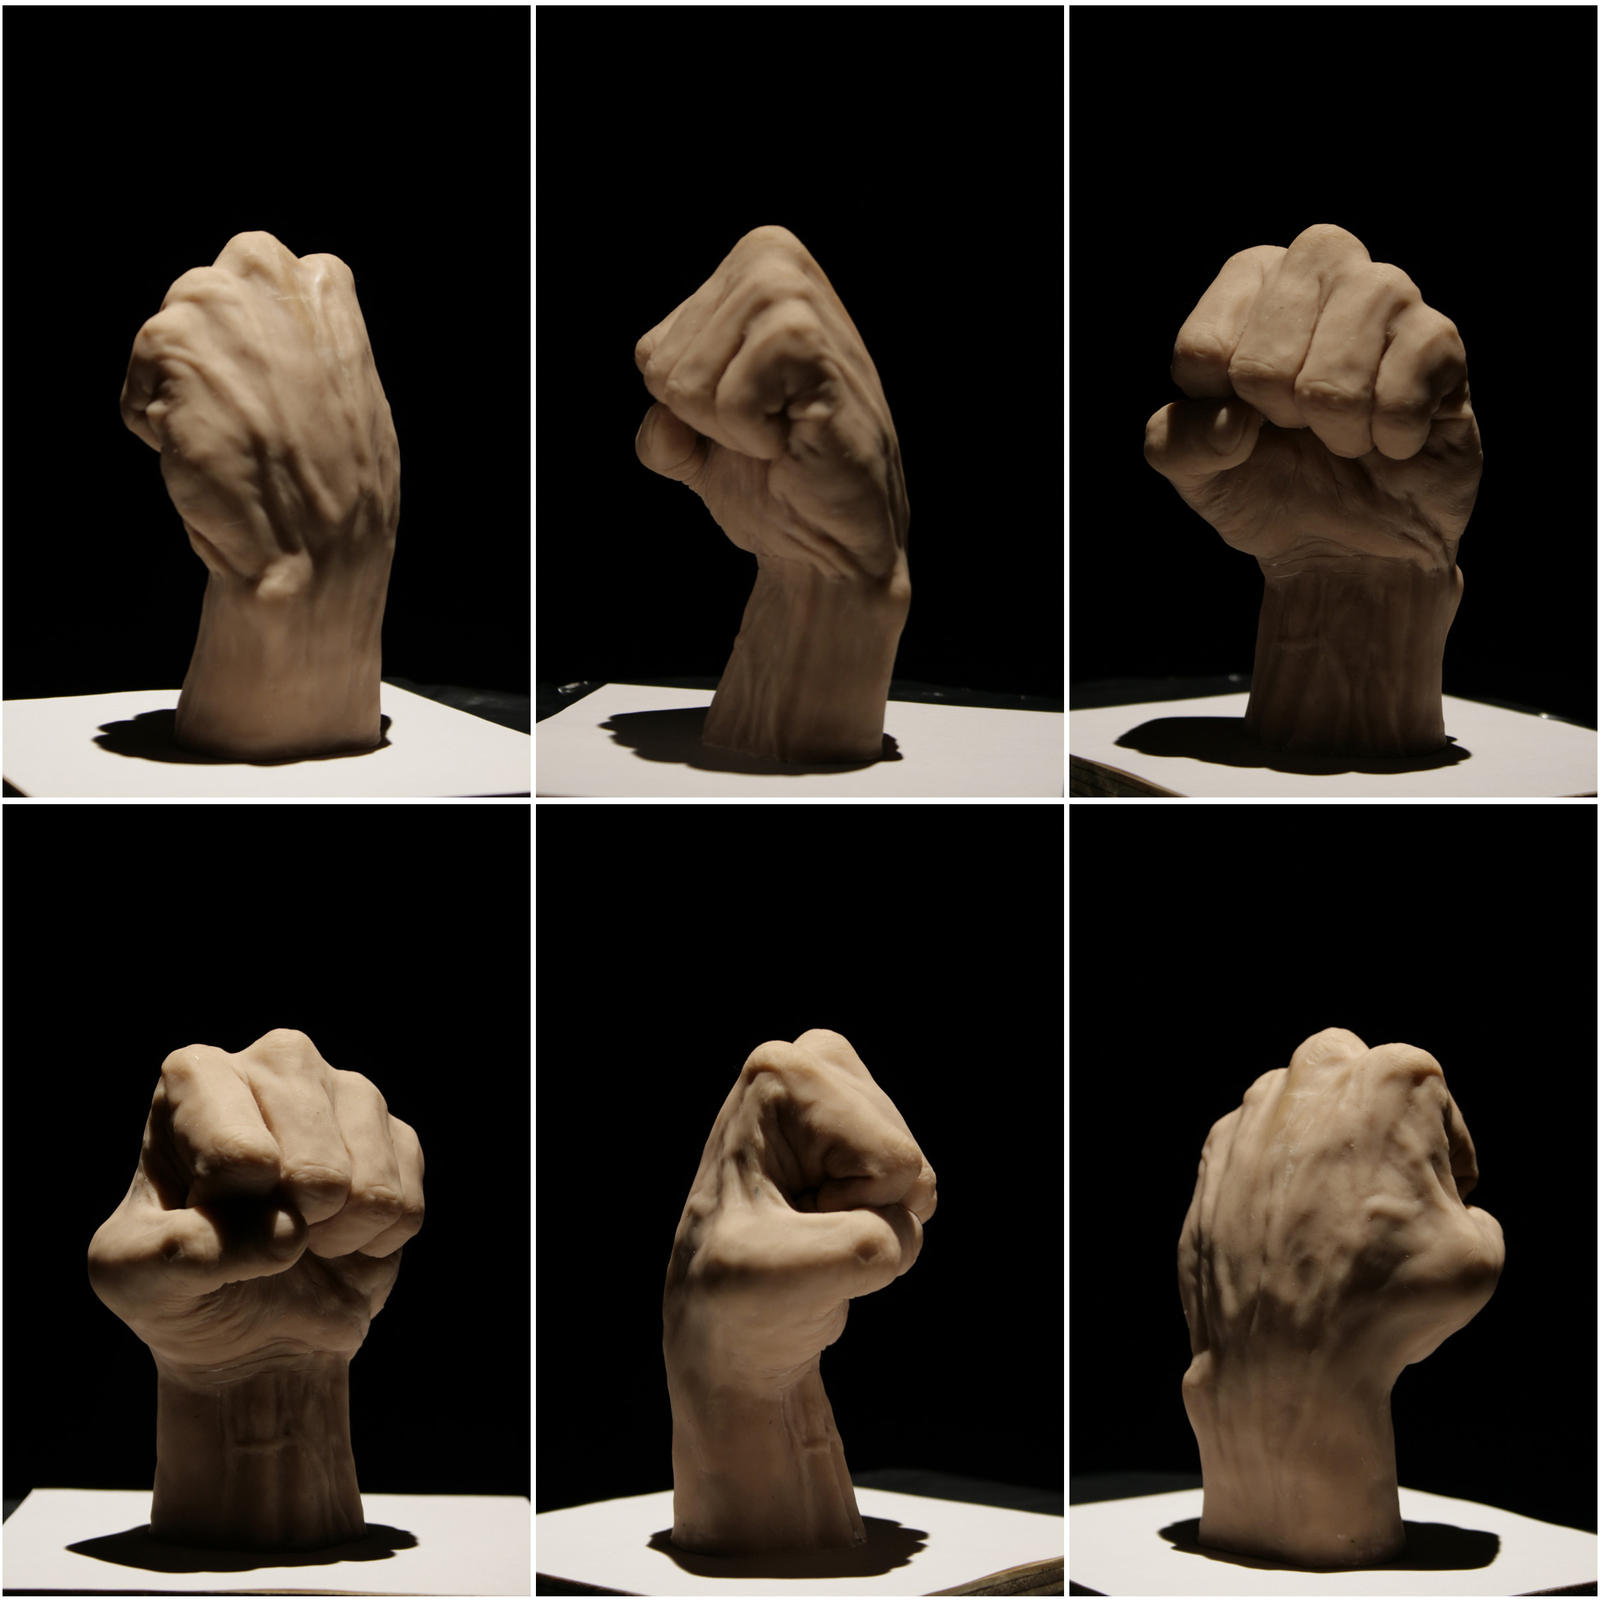 fist study by kezeff